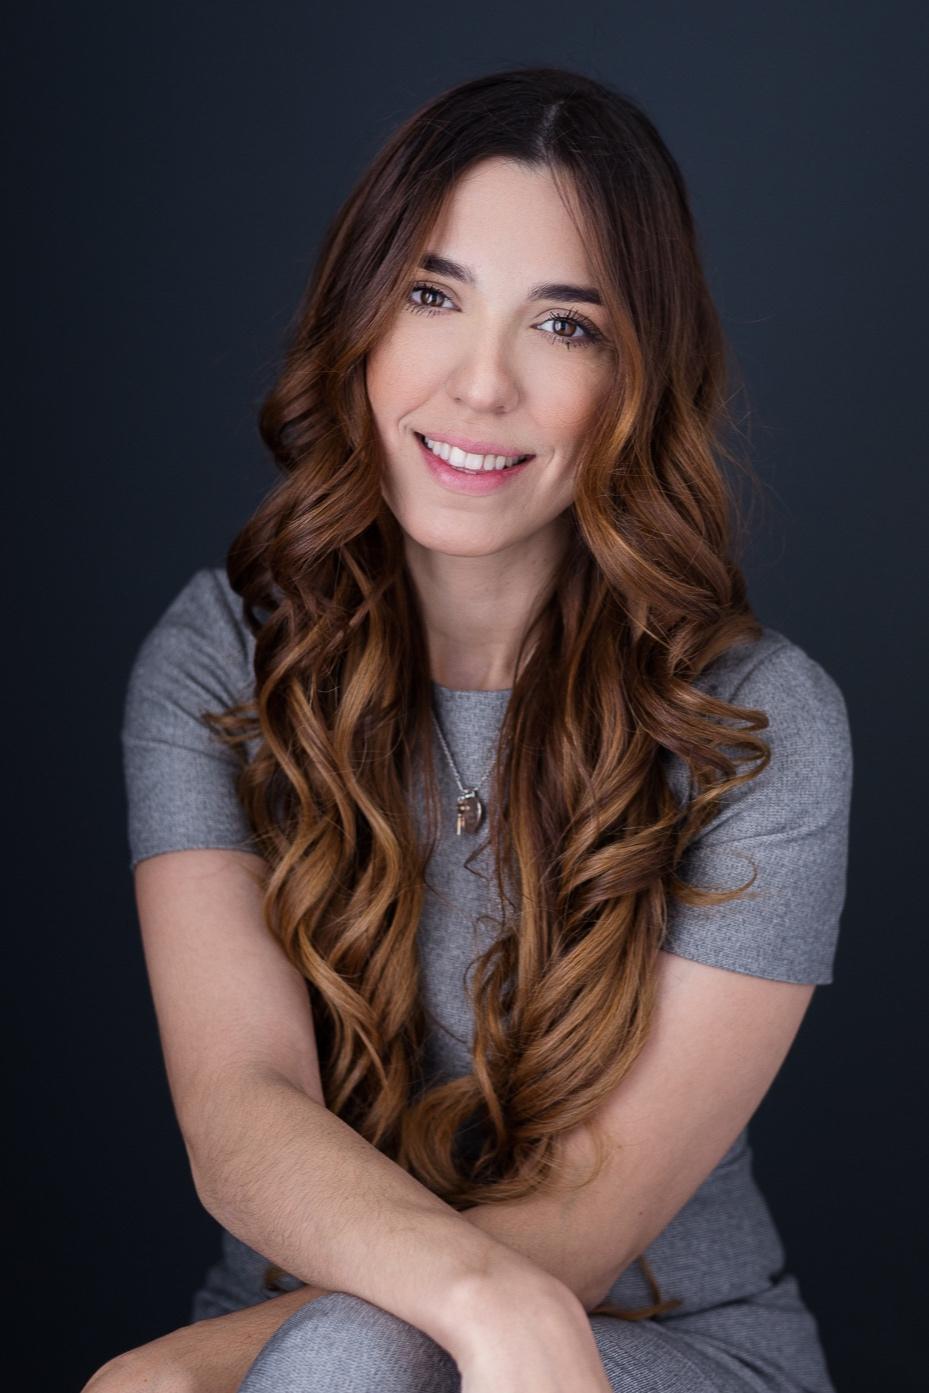 Melissa-Alcantar-Fotografia-Sesion-fotos-mexicali-retrato-Zayda-